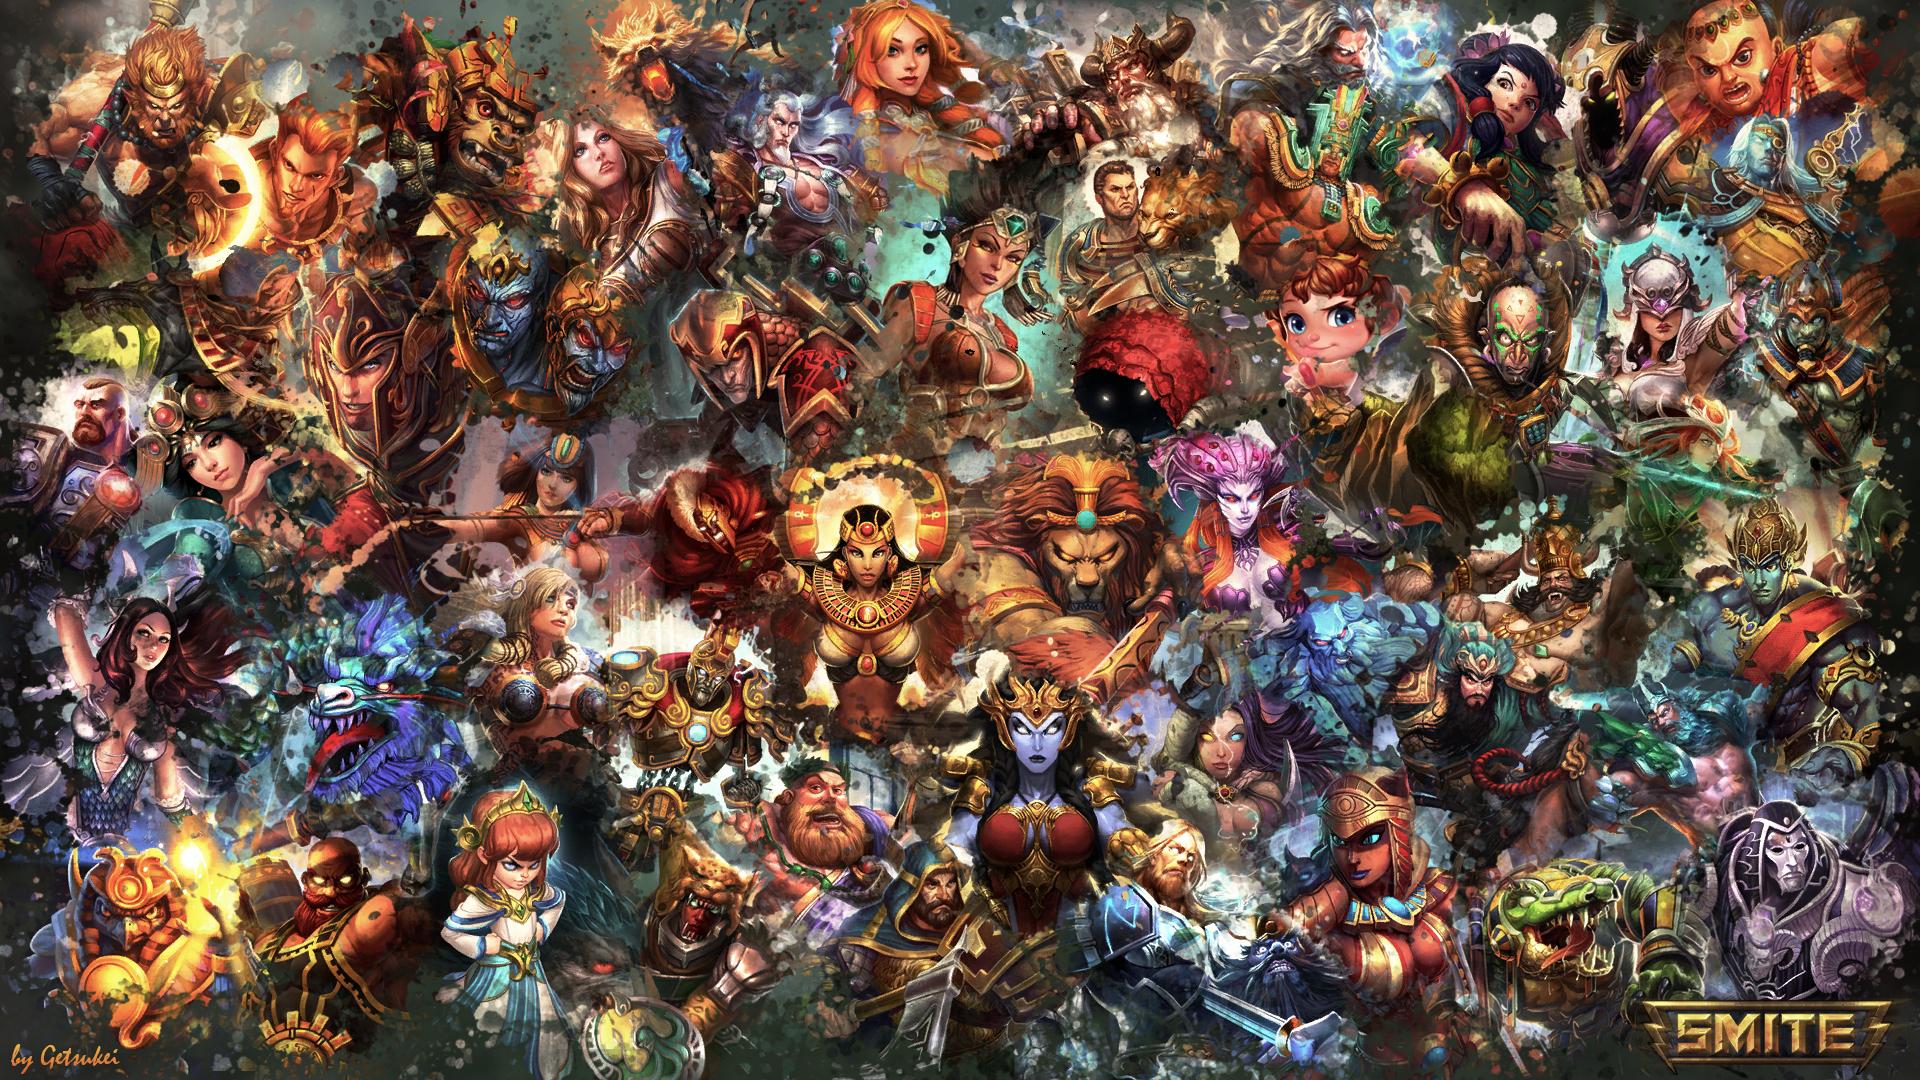 Smite All Gods Wallpaper Serqet Edition By Getsukeii On Deviantart